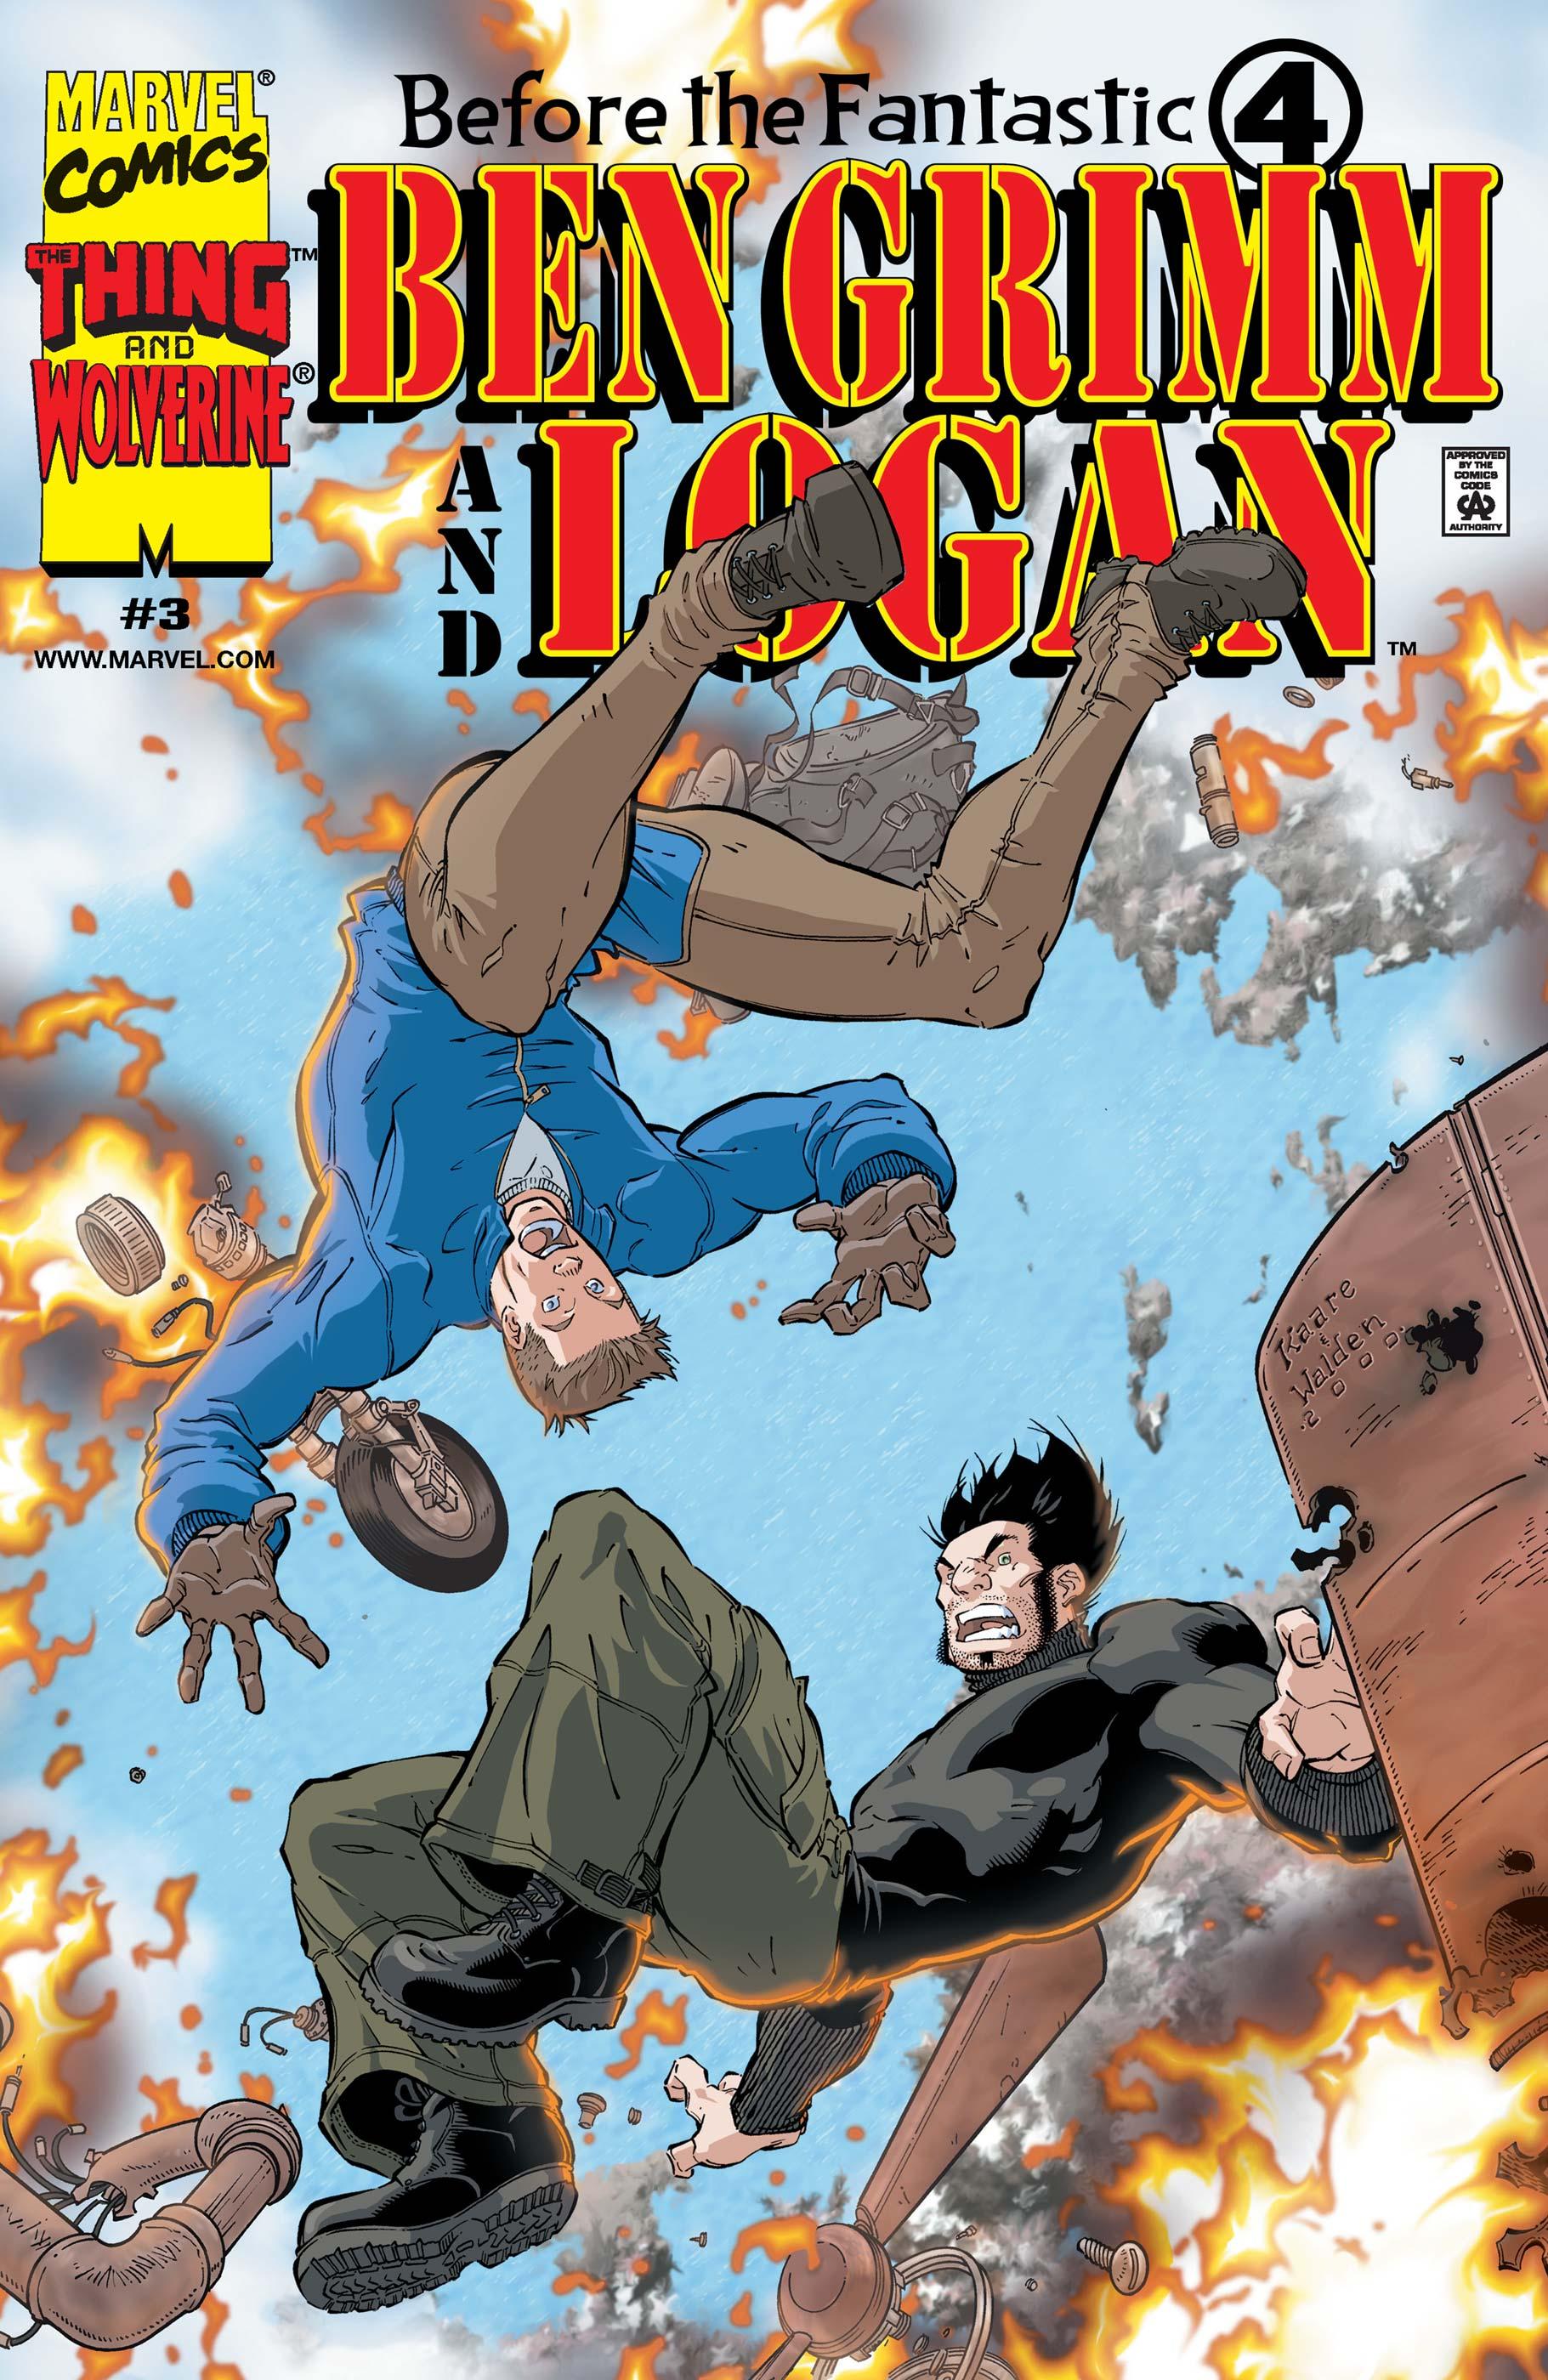 Before the Fantastic Four: Ben Grimm & Logan (2000) #3